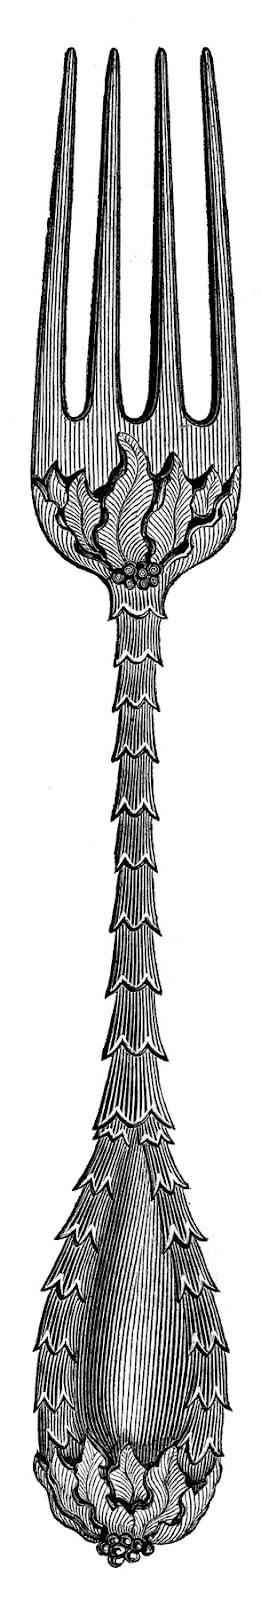 Vintage Clip Art Fancy Utensils Fork Spoon Knife The